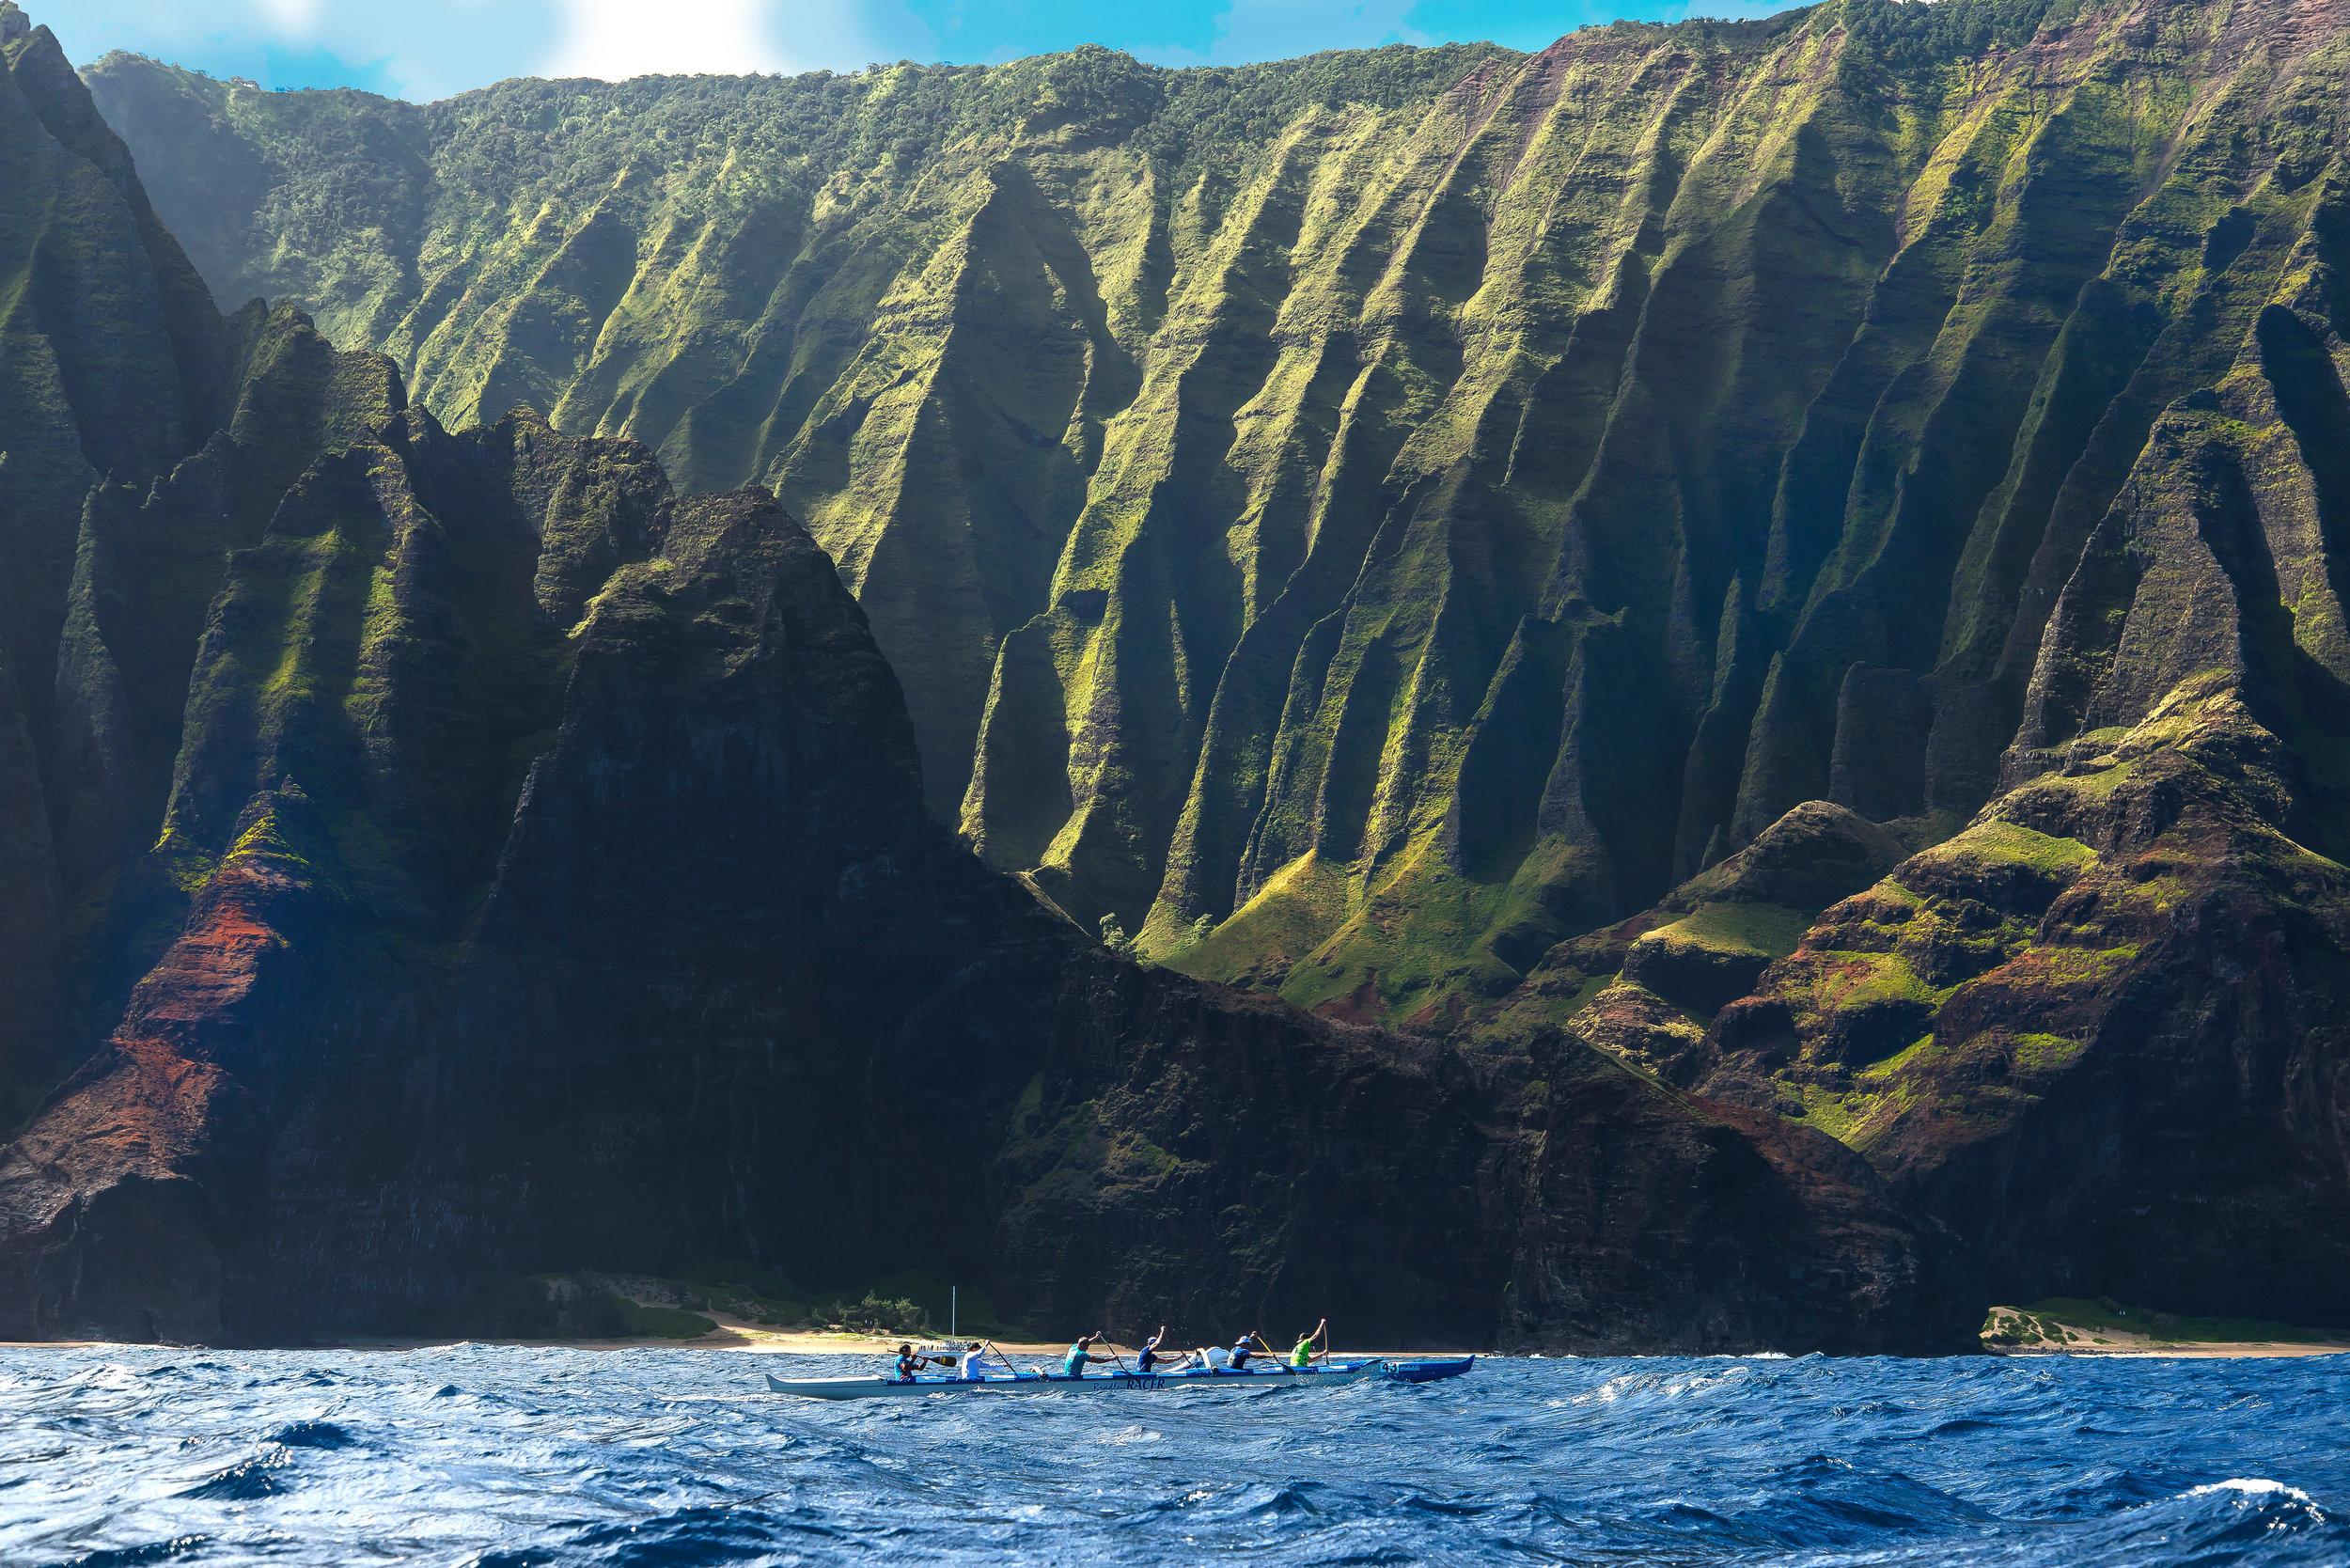 Creighton and Kailua Canoe Club paddling off Kauai. Photo courtesy of Creighton litton.